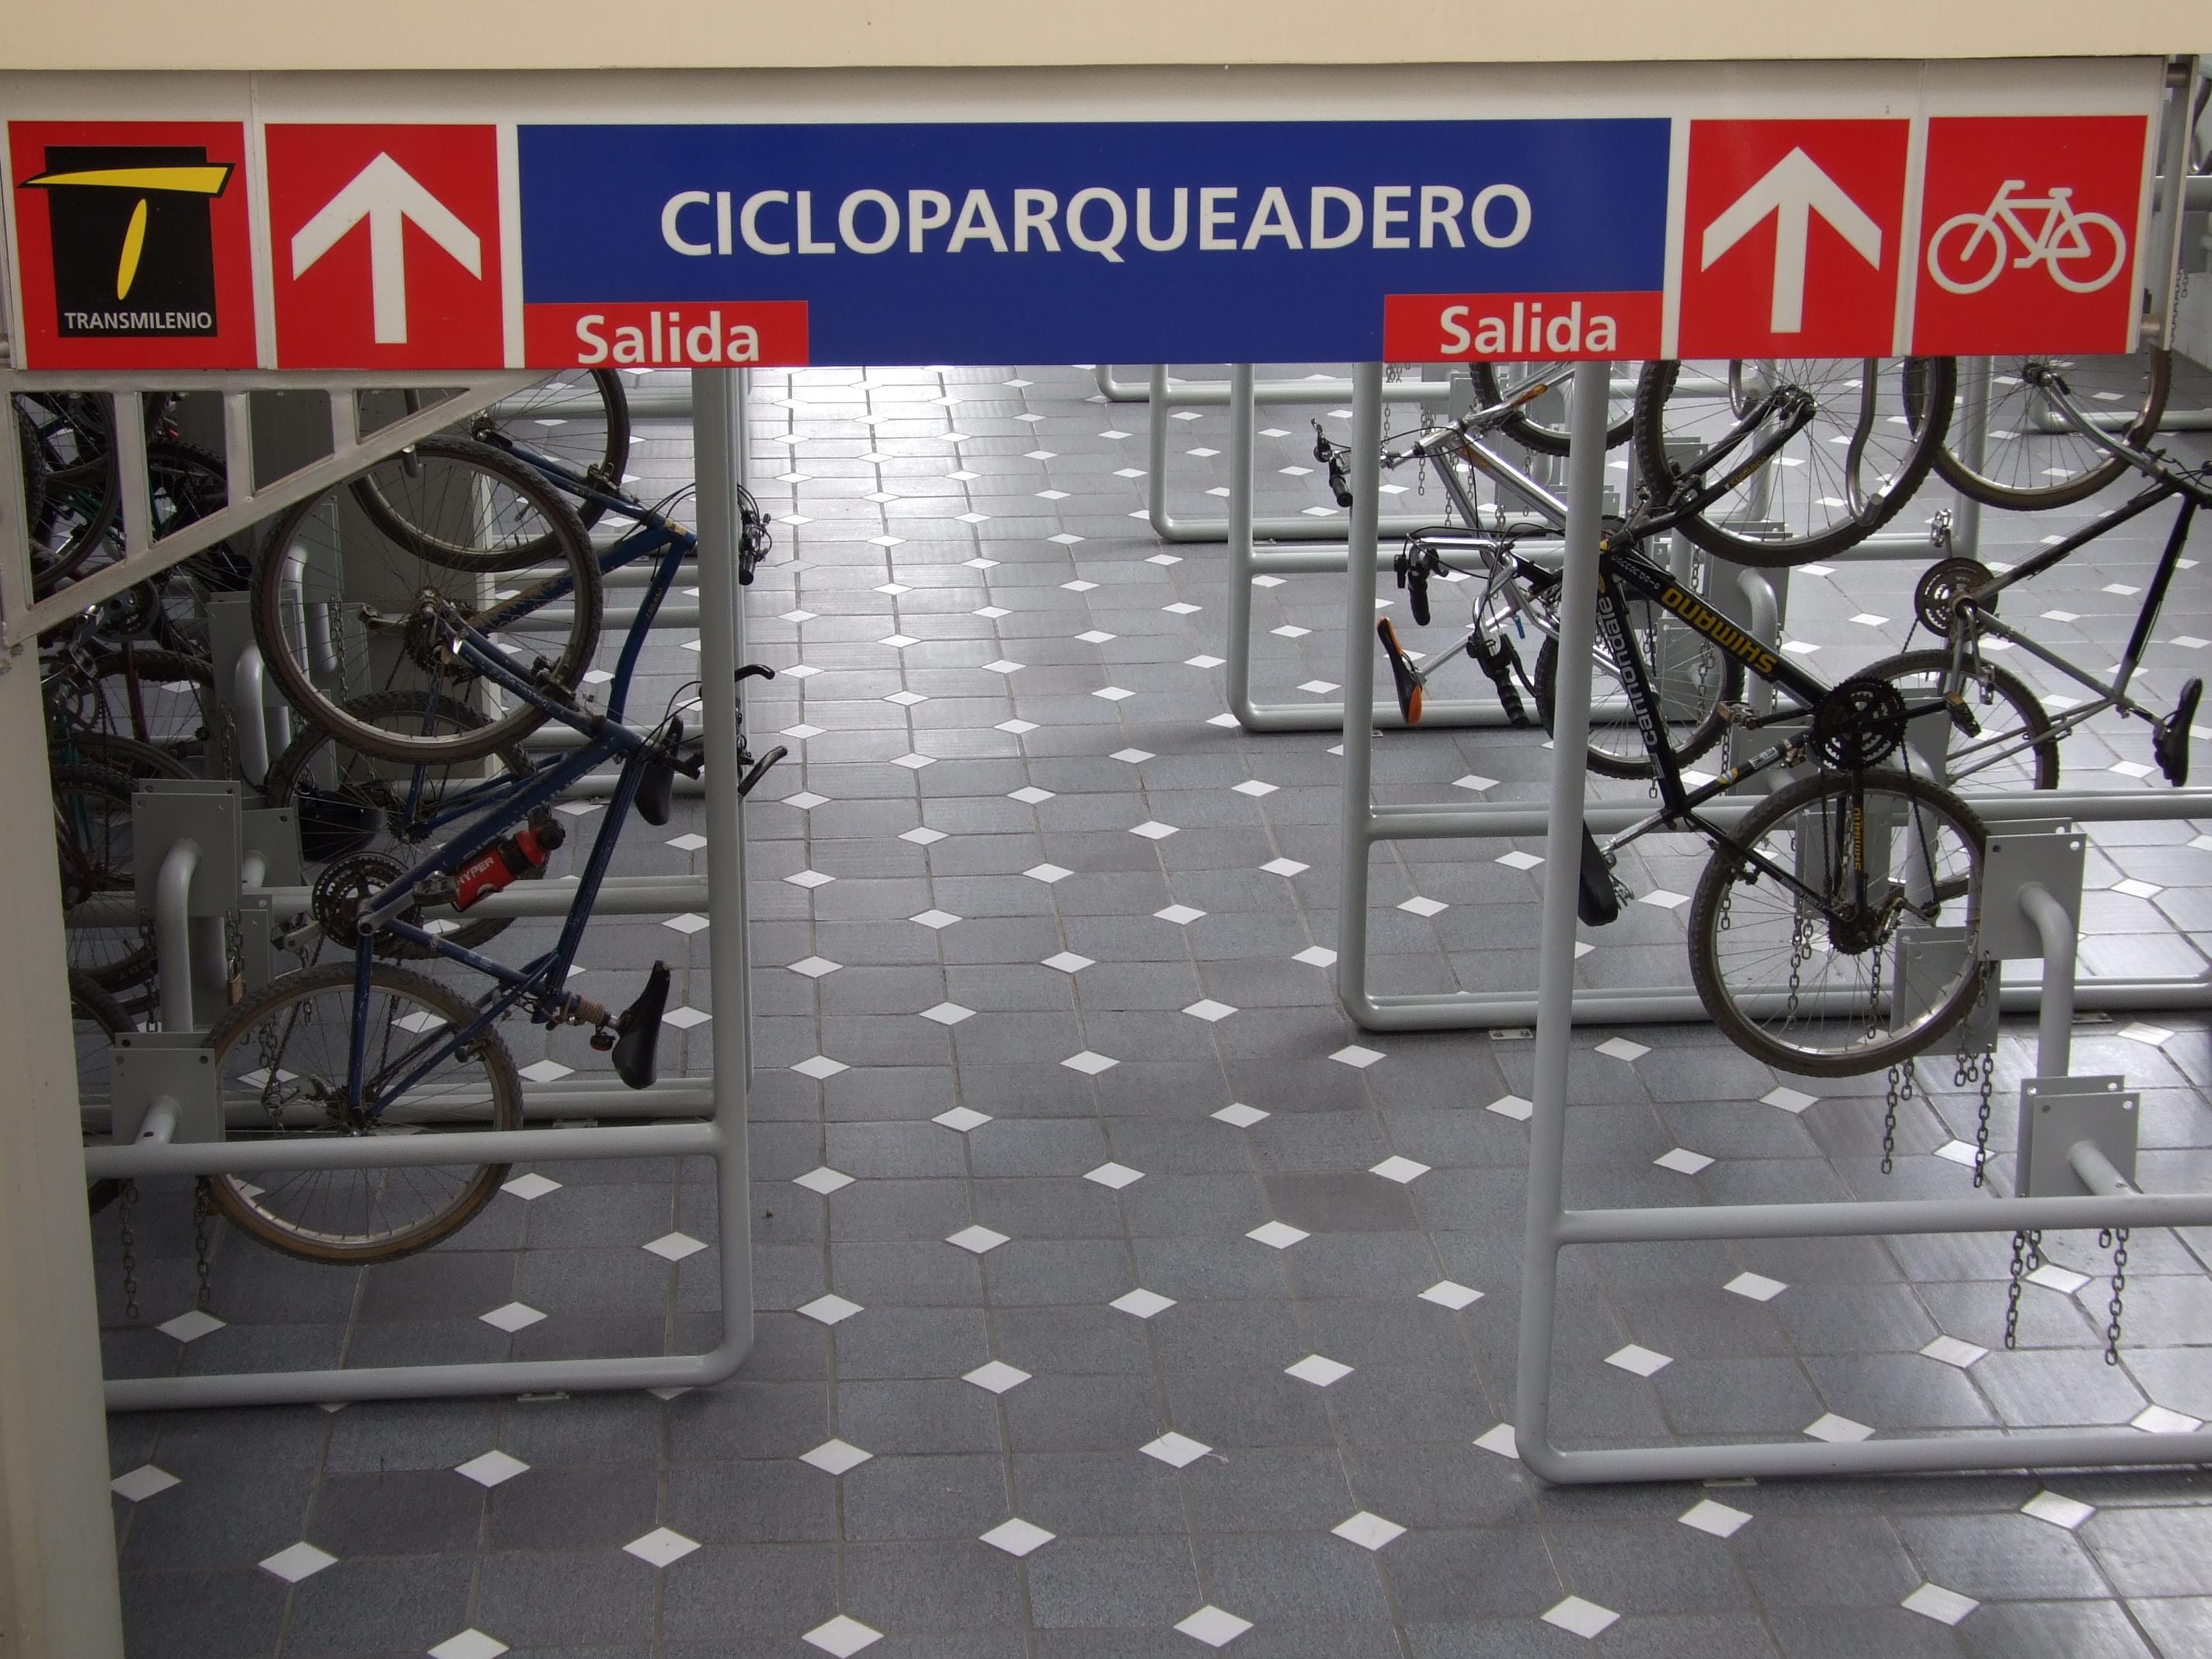 bike-park-transmilenio (1)